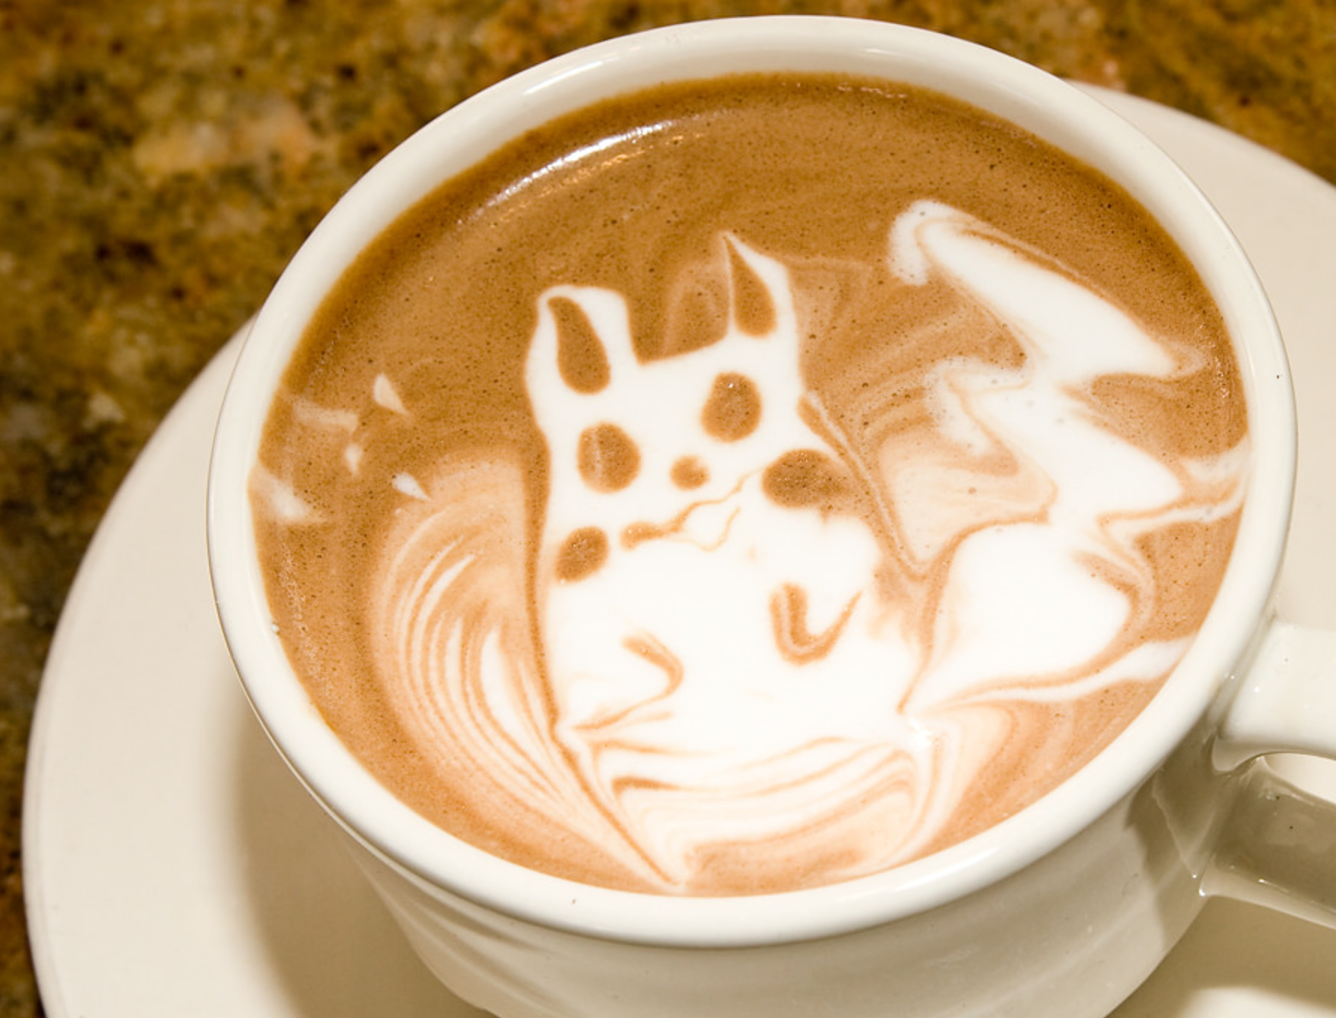 Pikachu Latte, I Choose You!